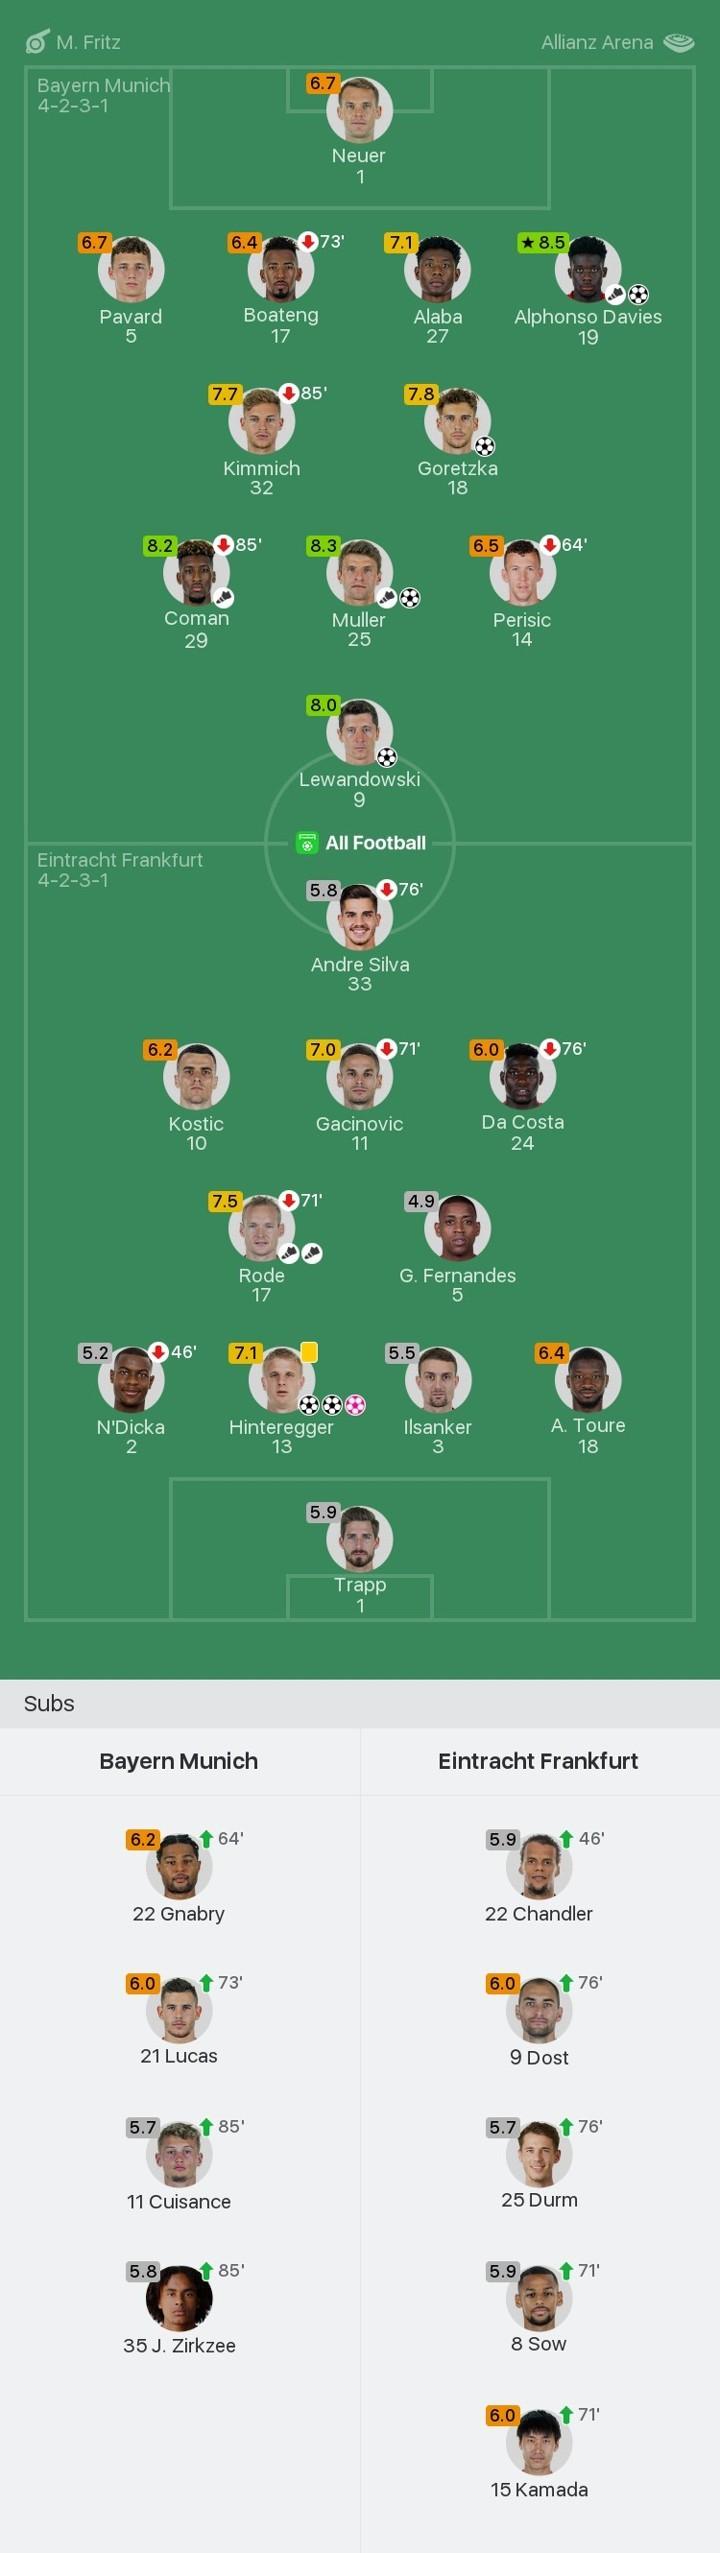 Bayern vs Frankfurt player ratings: Alphonso Davies MOTM rated 8.5, Lewy 8.0